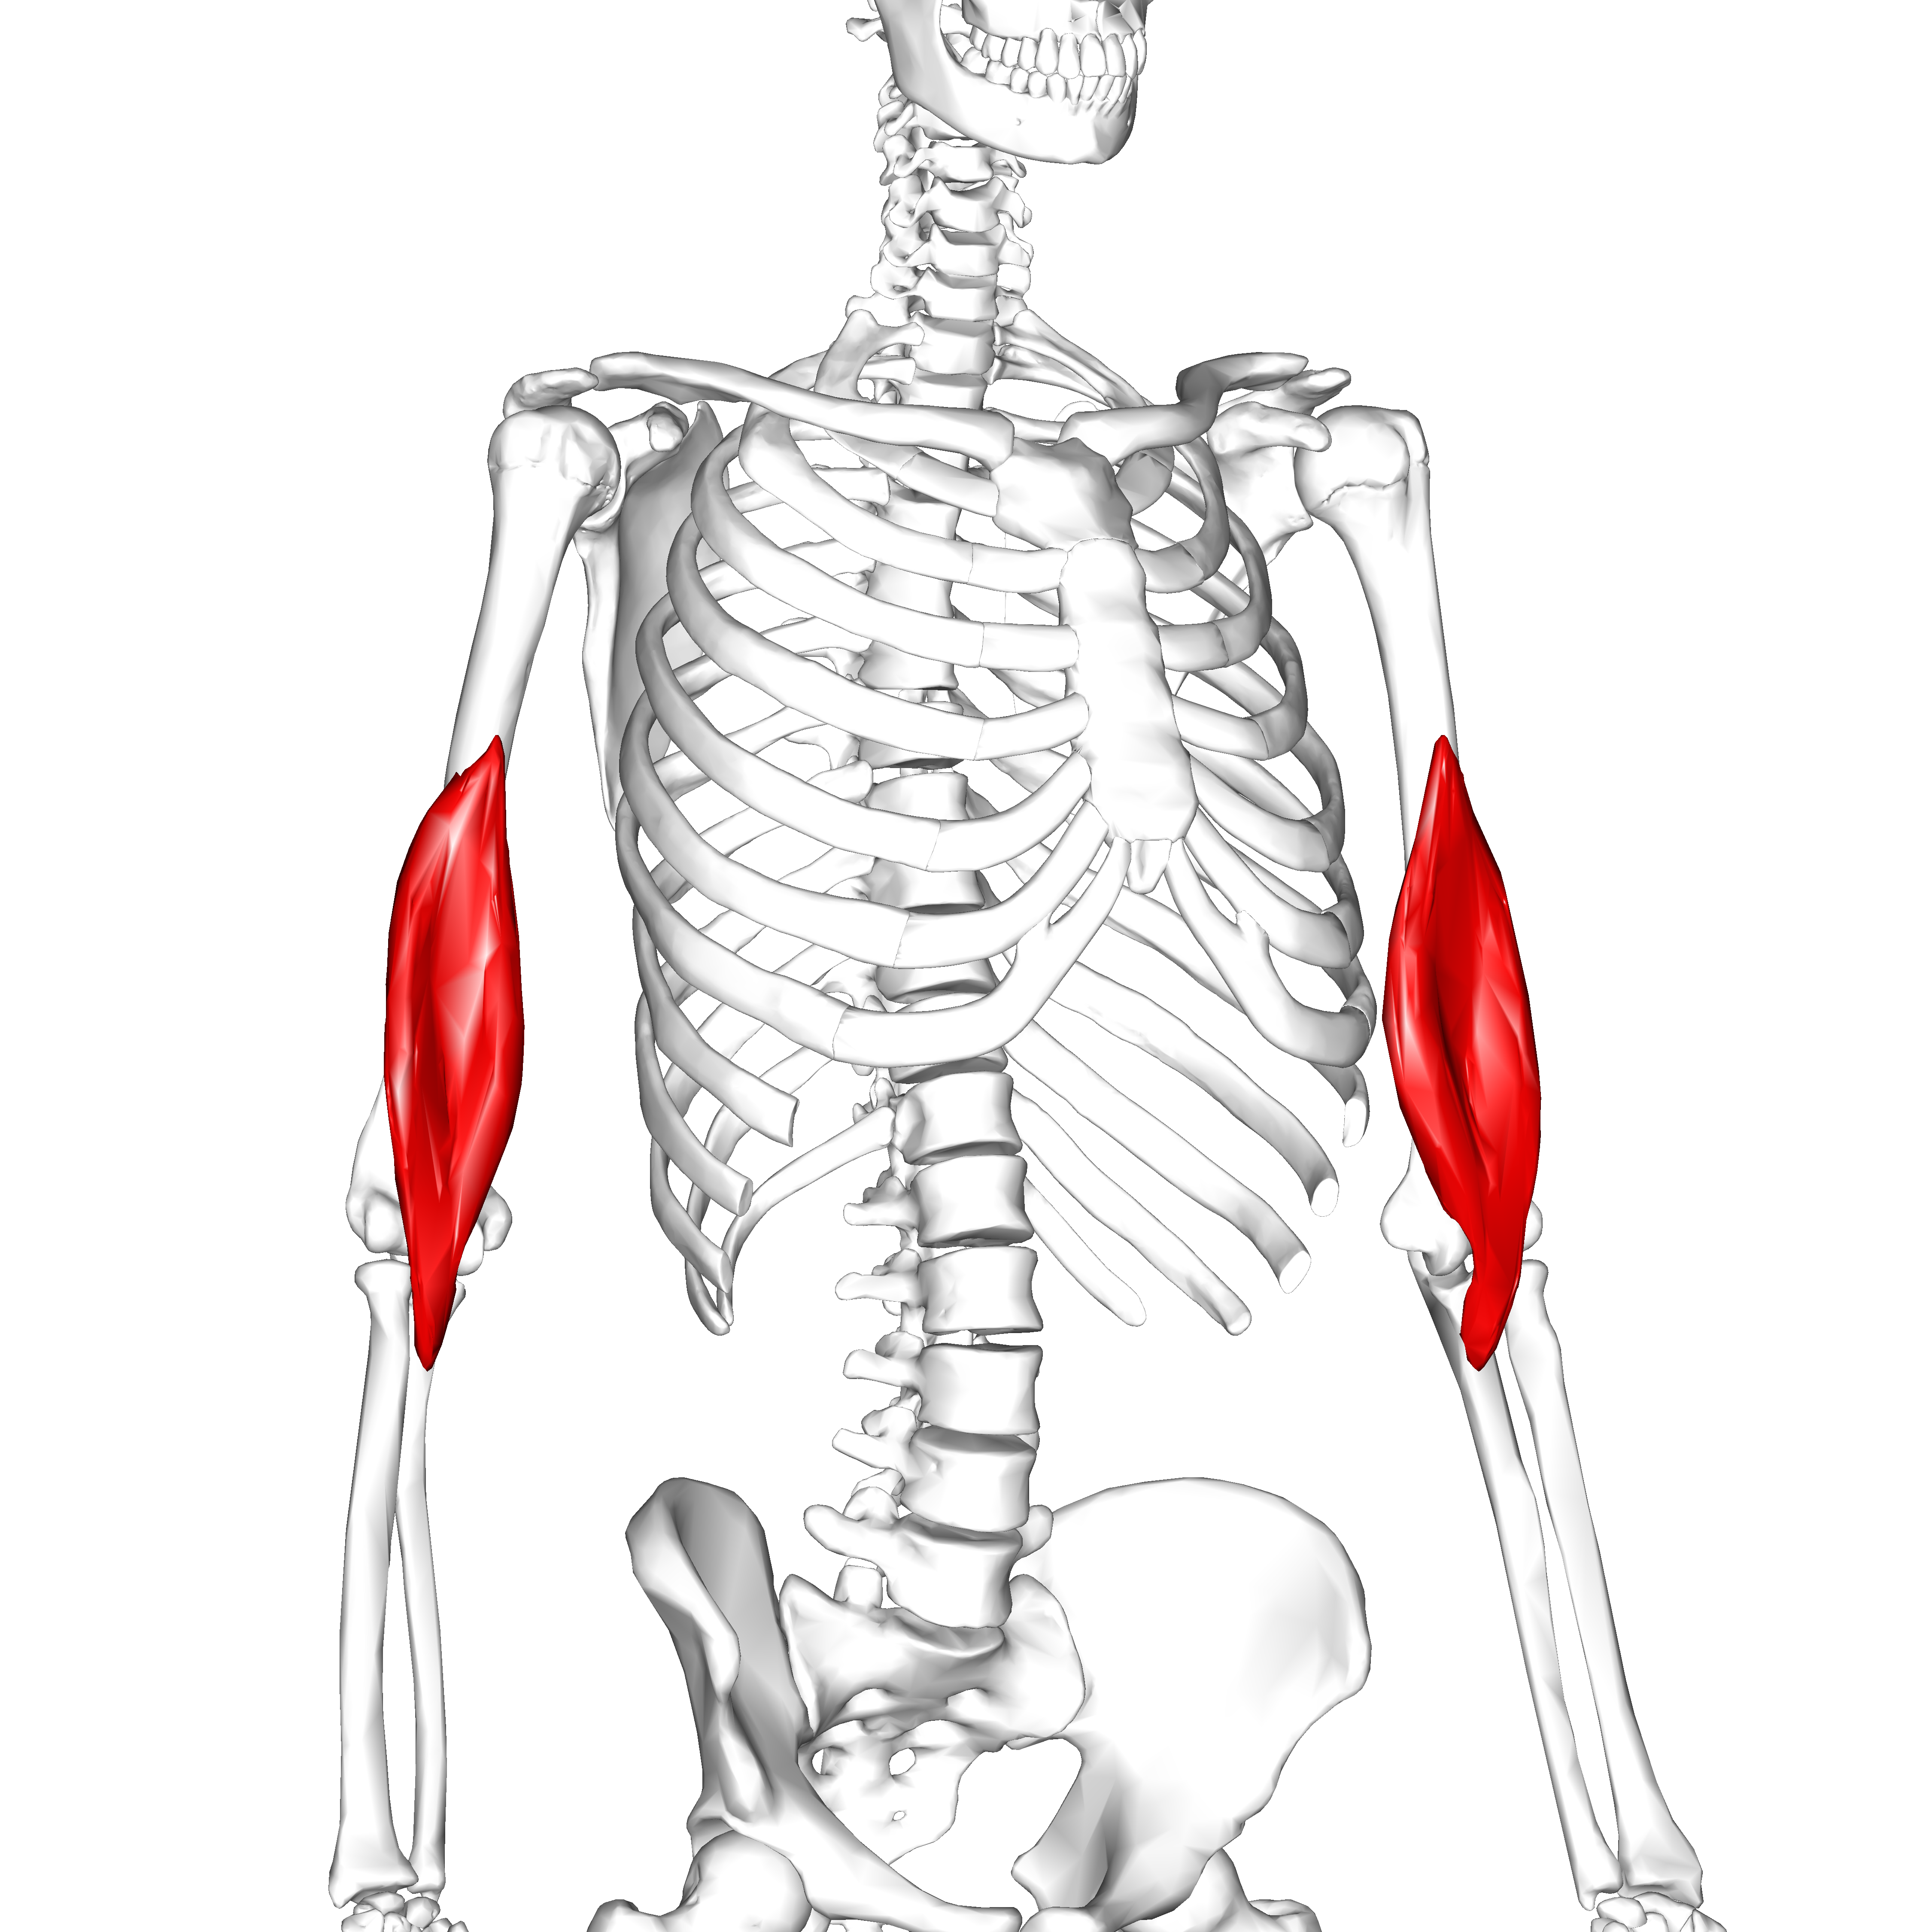 File:Brachialis muscle02.png - Wikimedia Commons